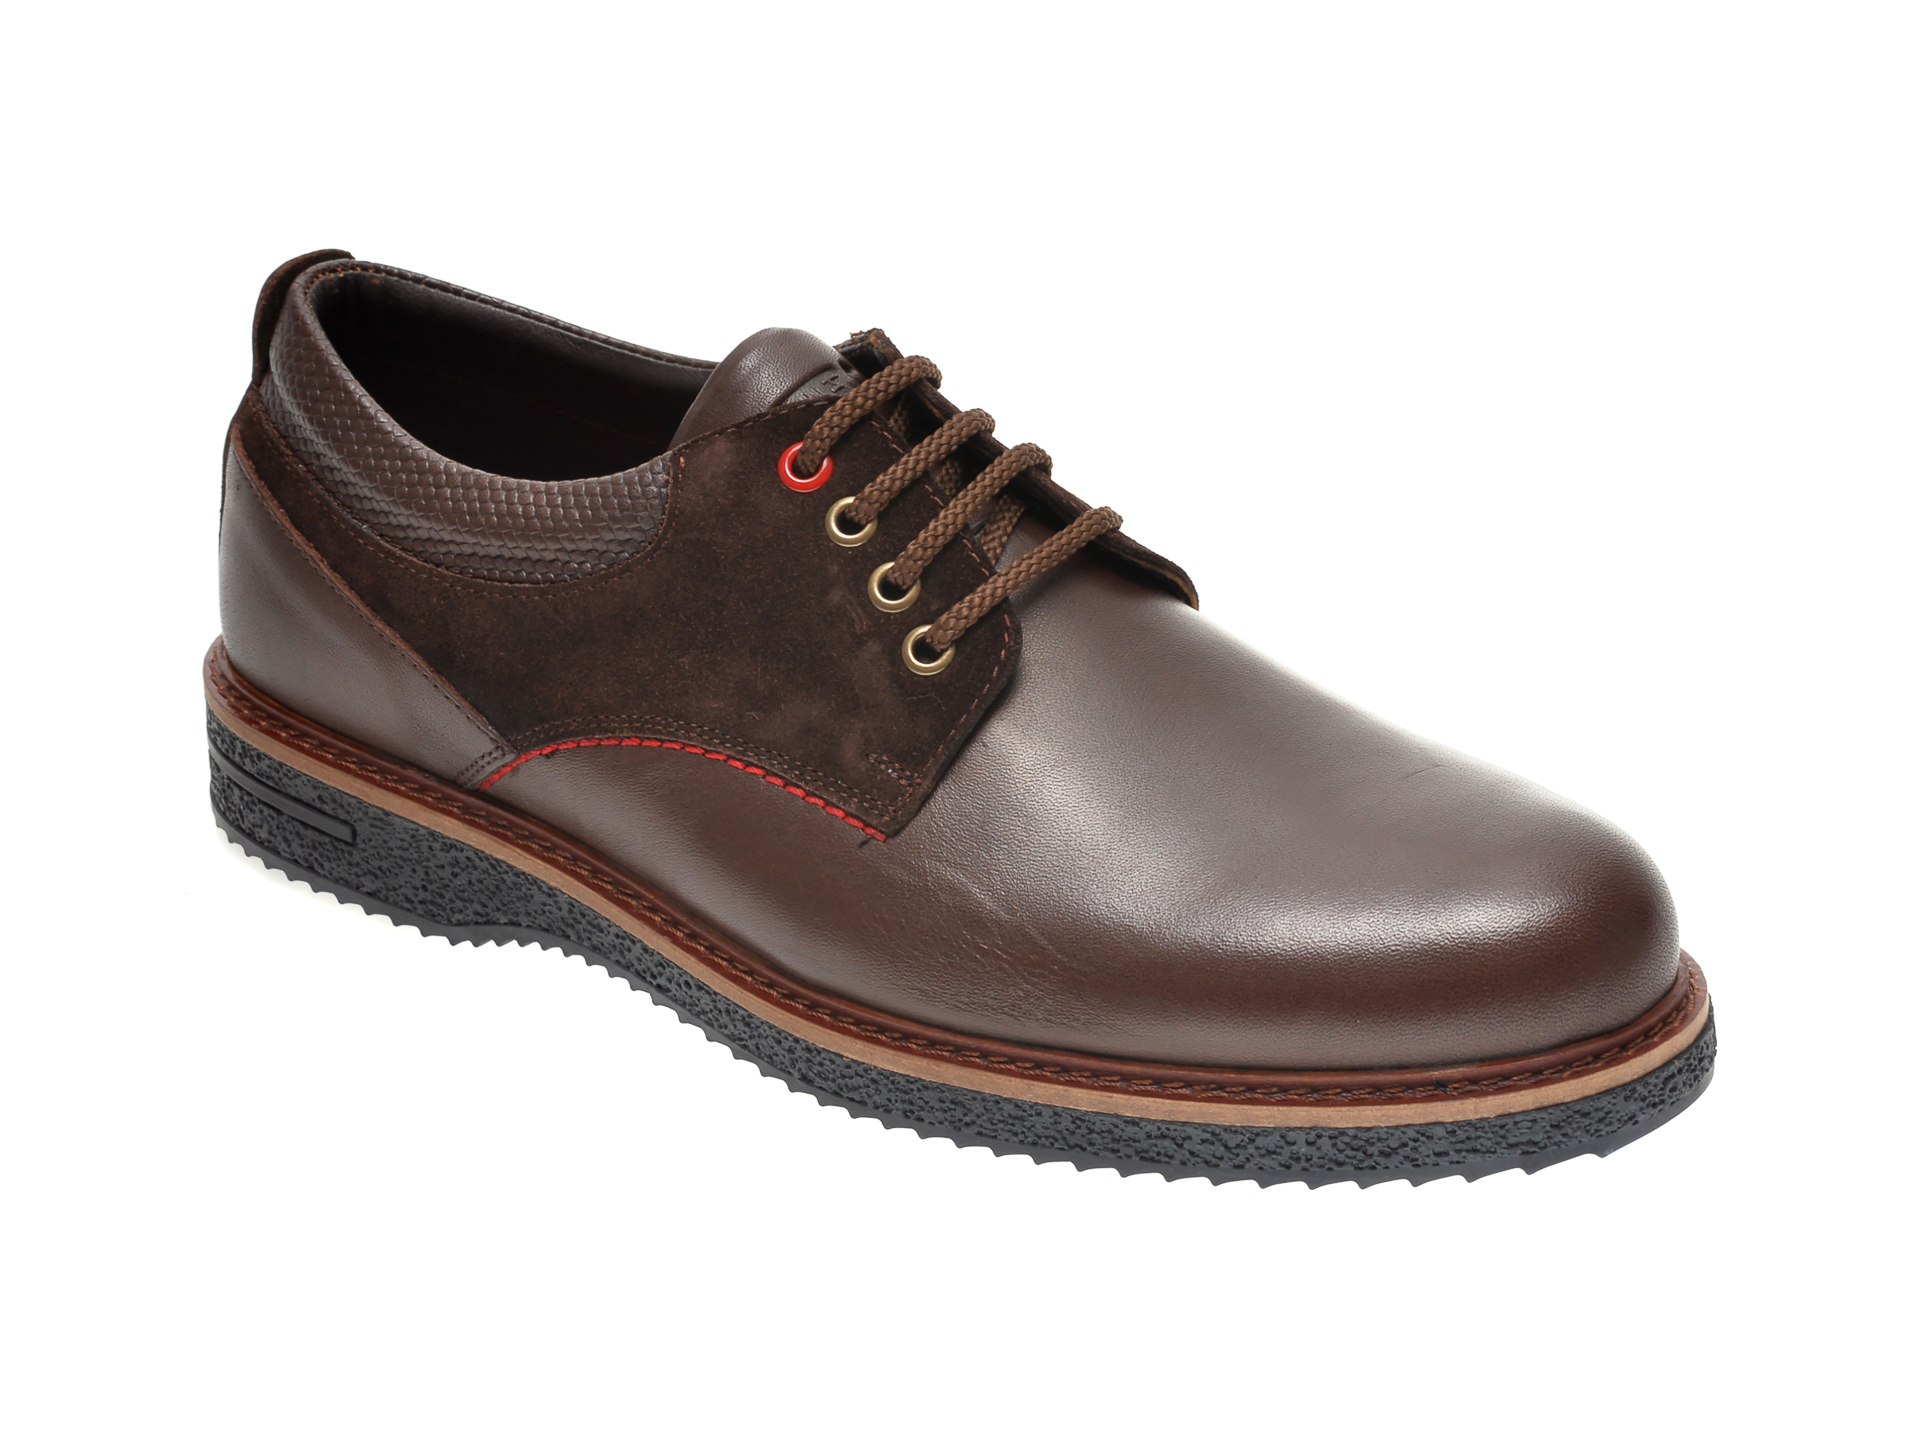 Pantofi OTTER maro, 20, din piele naturala New